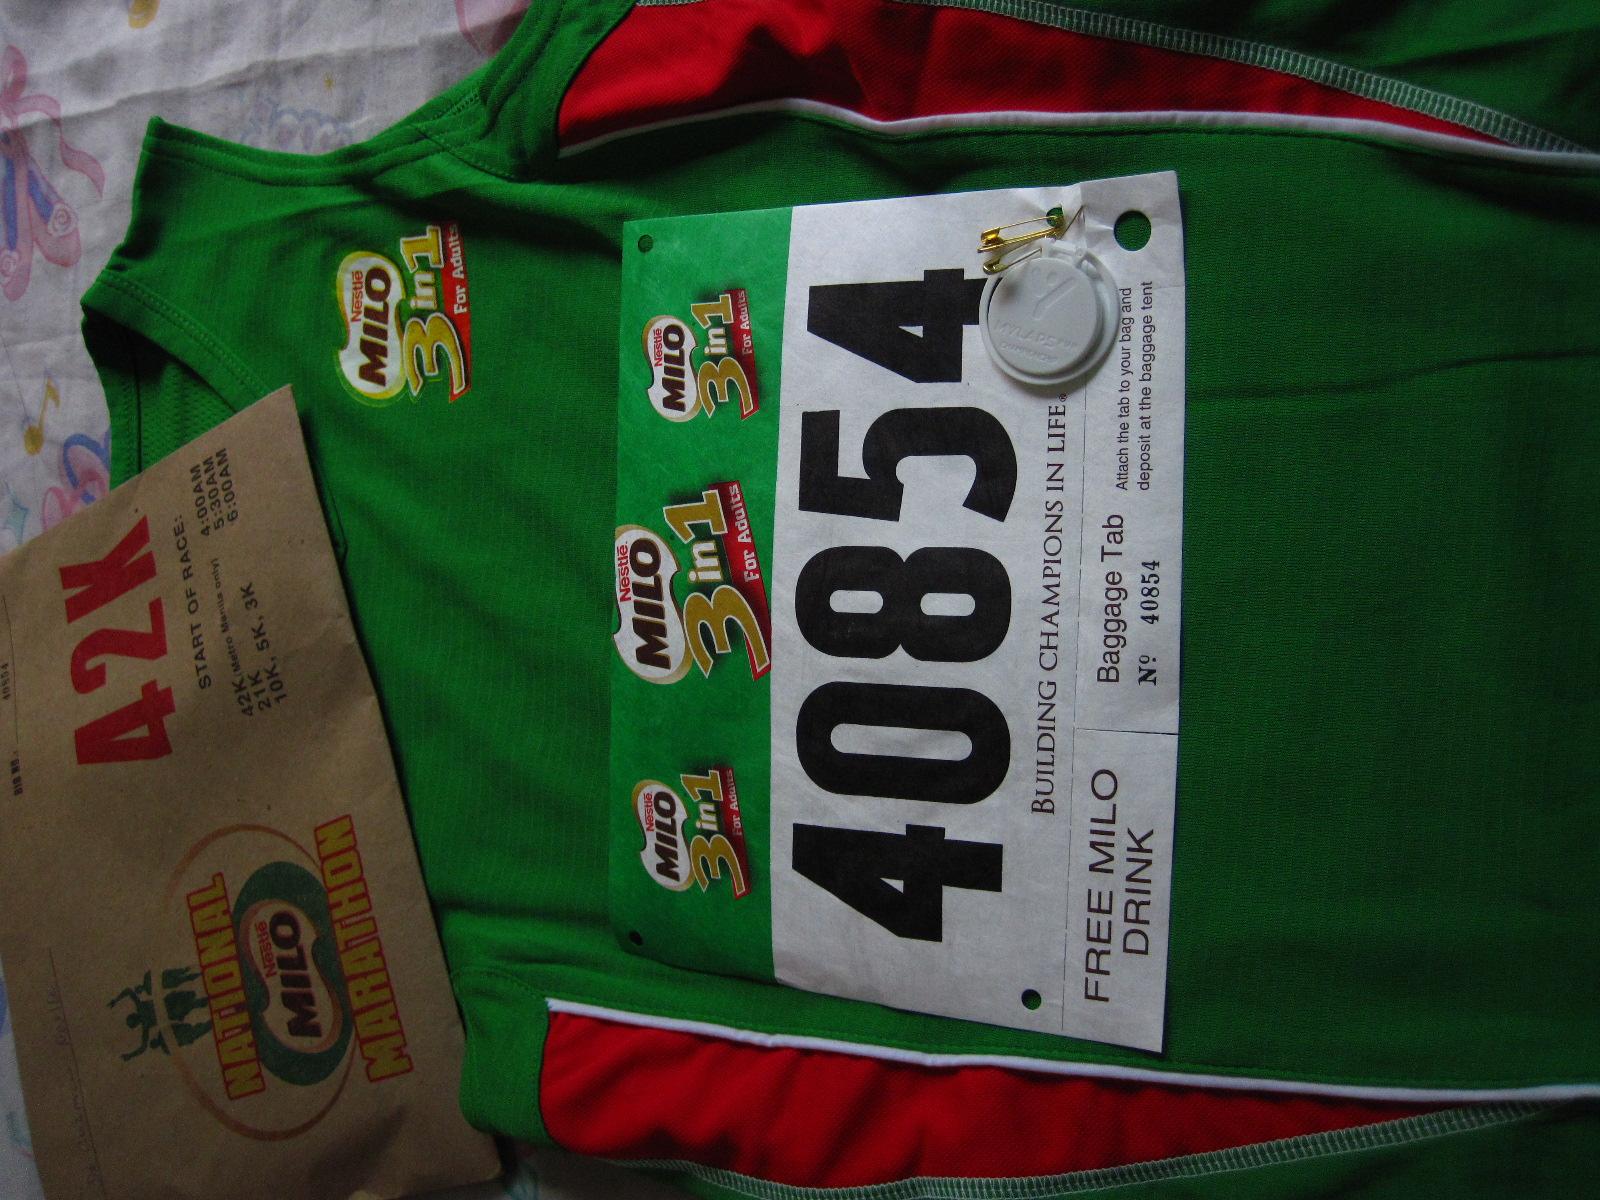 34th Milo Marathon Race Kit